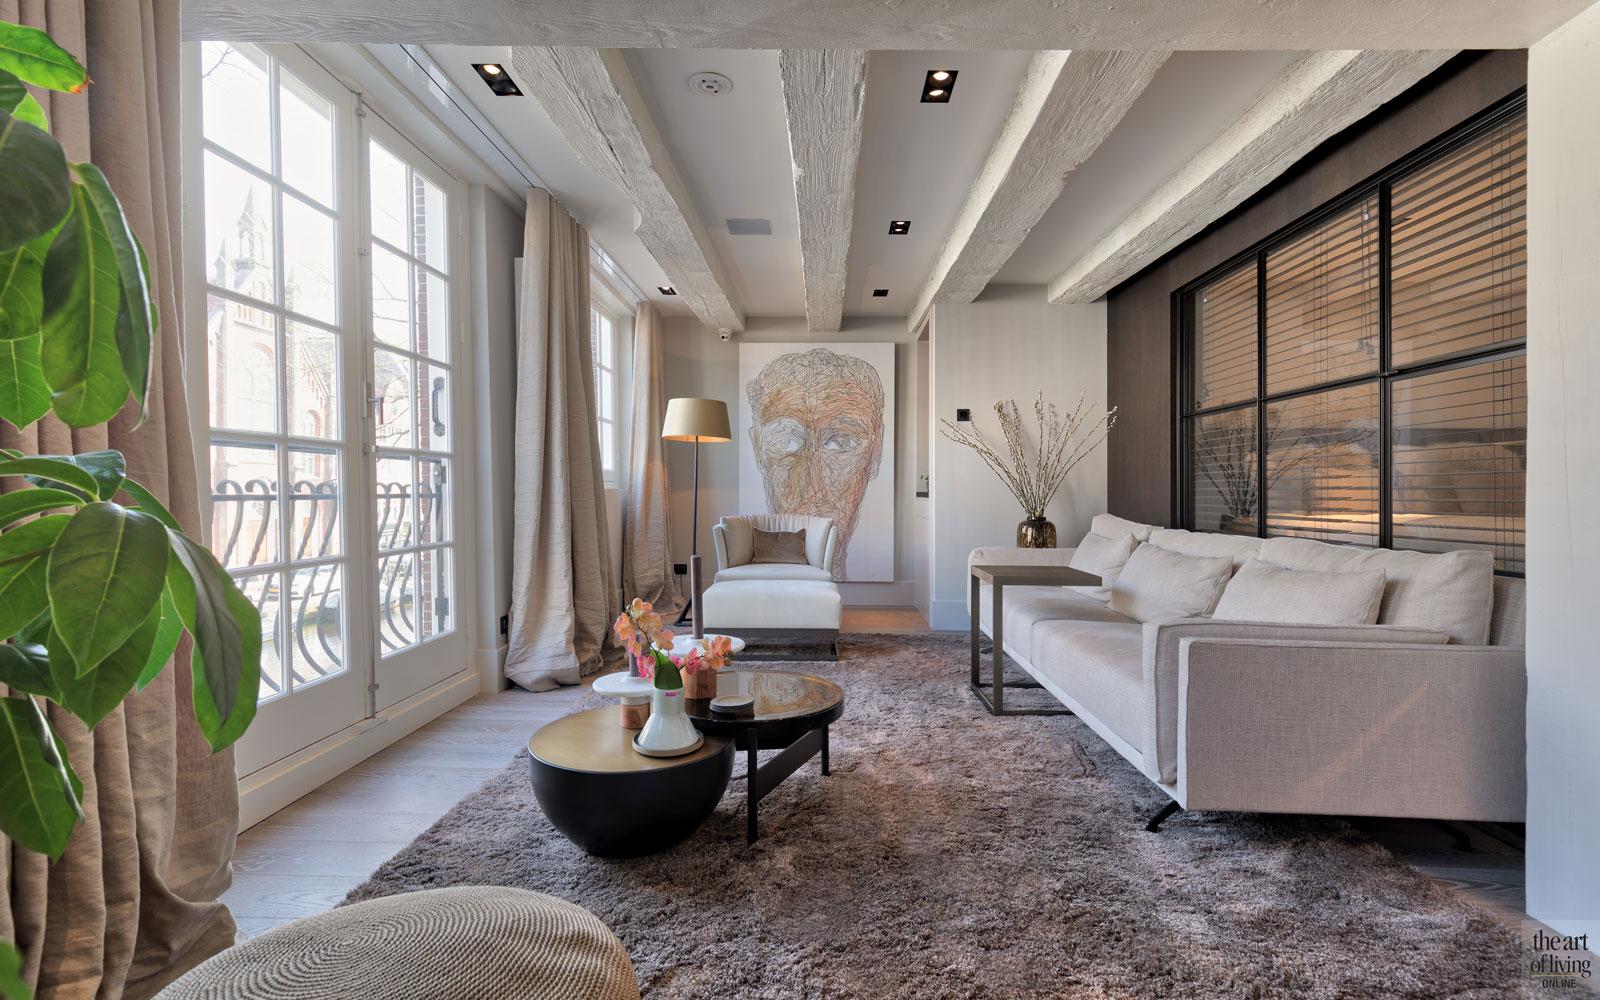 Woonkamer, living, grote ramen, lichtinval, Marcel Wolterinck, kunst, sfeervolle lift, Studio Vendrig